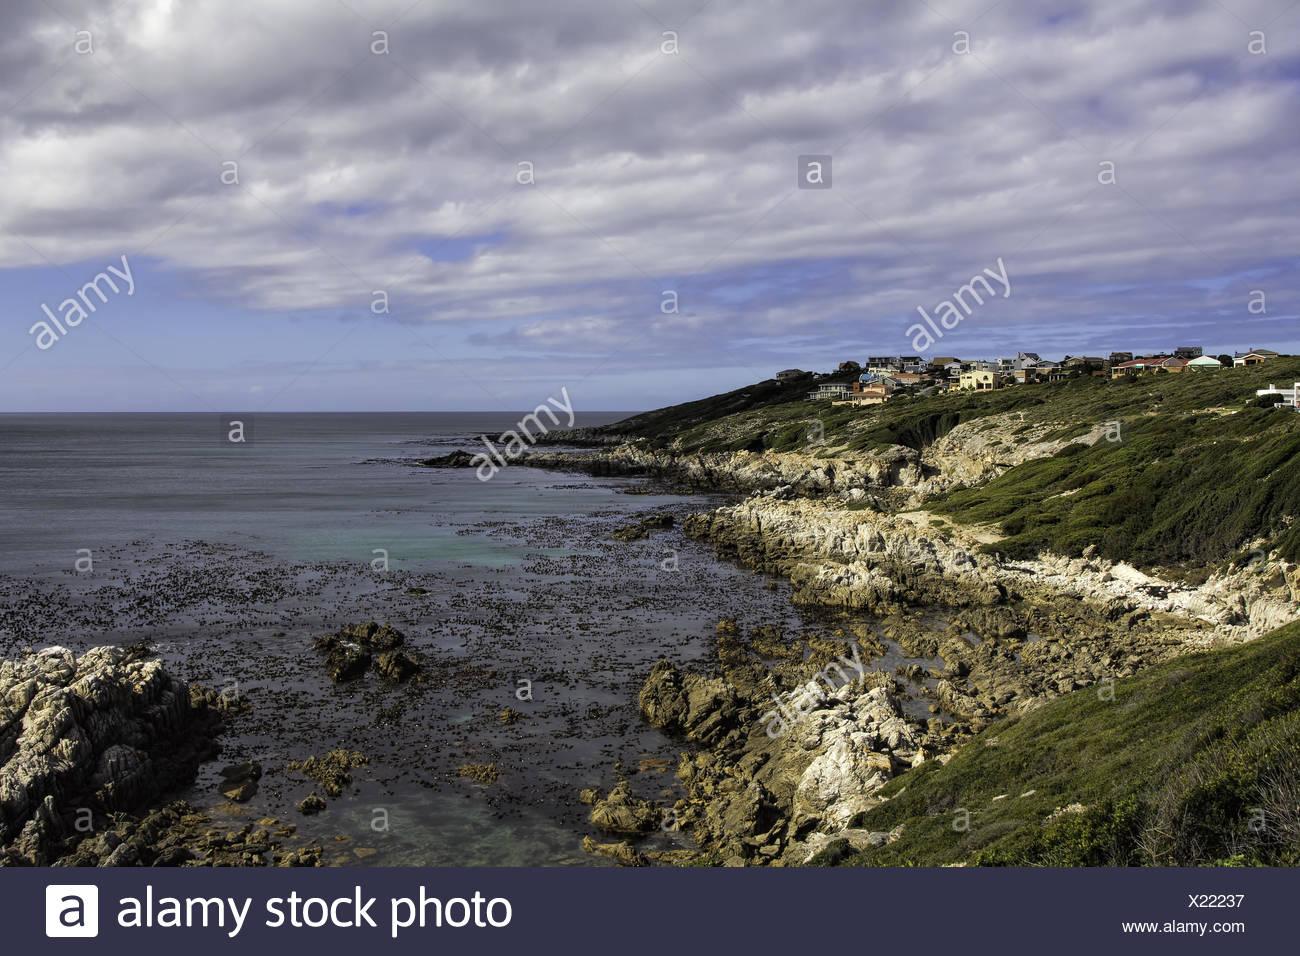 Cape Overberg - Stock Image